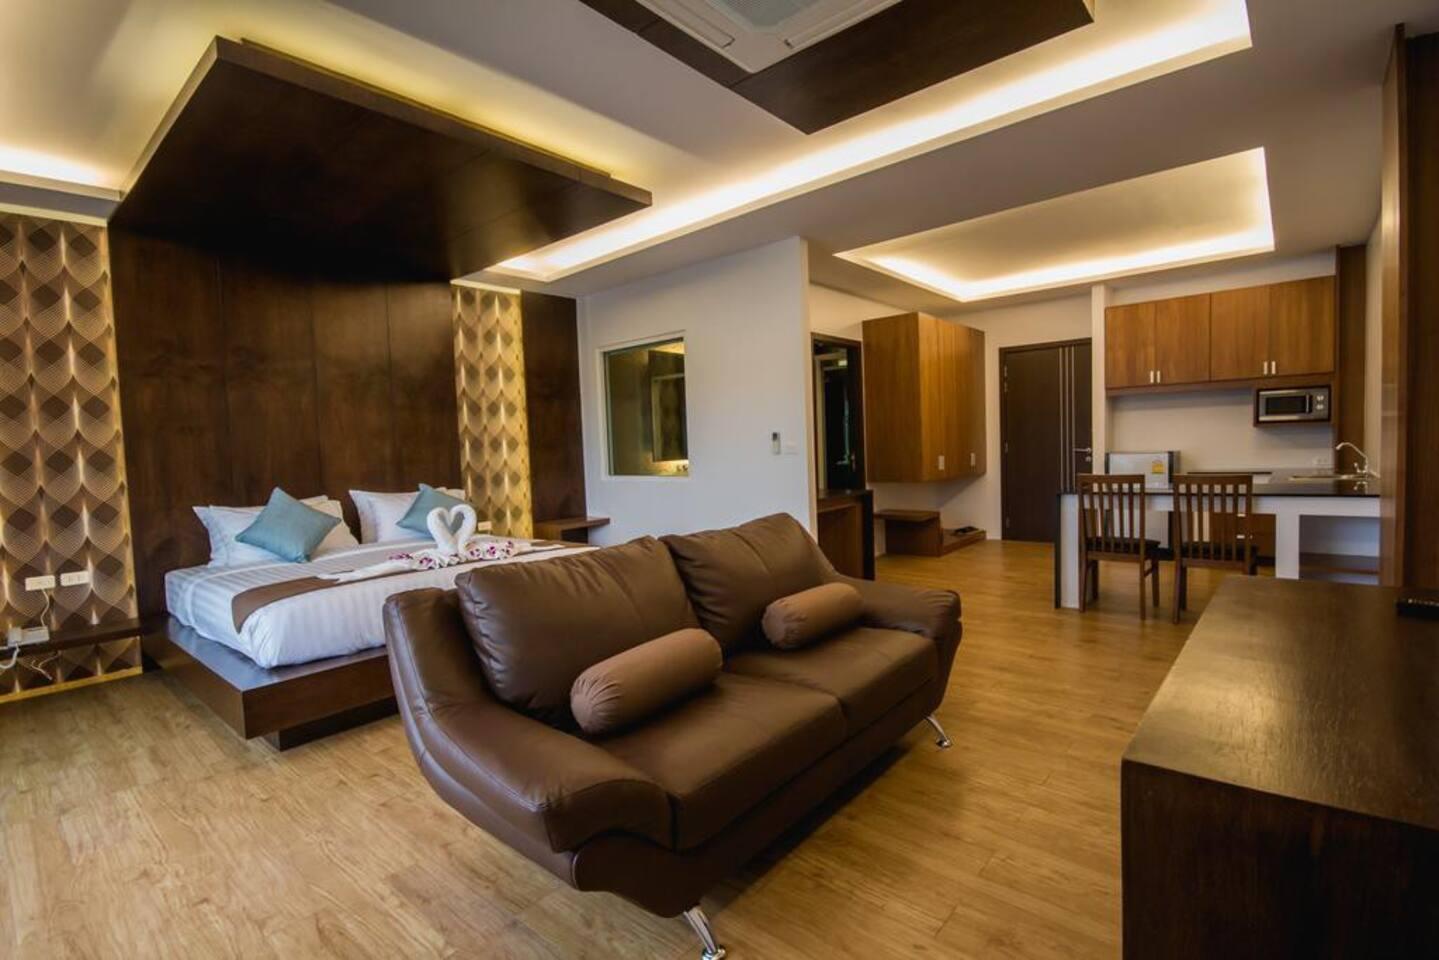 Luxury Room (3rd Floor) สตูดิโอ วิลลา 1 ห้องน้ำส่วนตัว ขนาด 40 ตร.ม. – อ่าวโละดาลัม